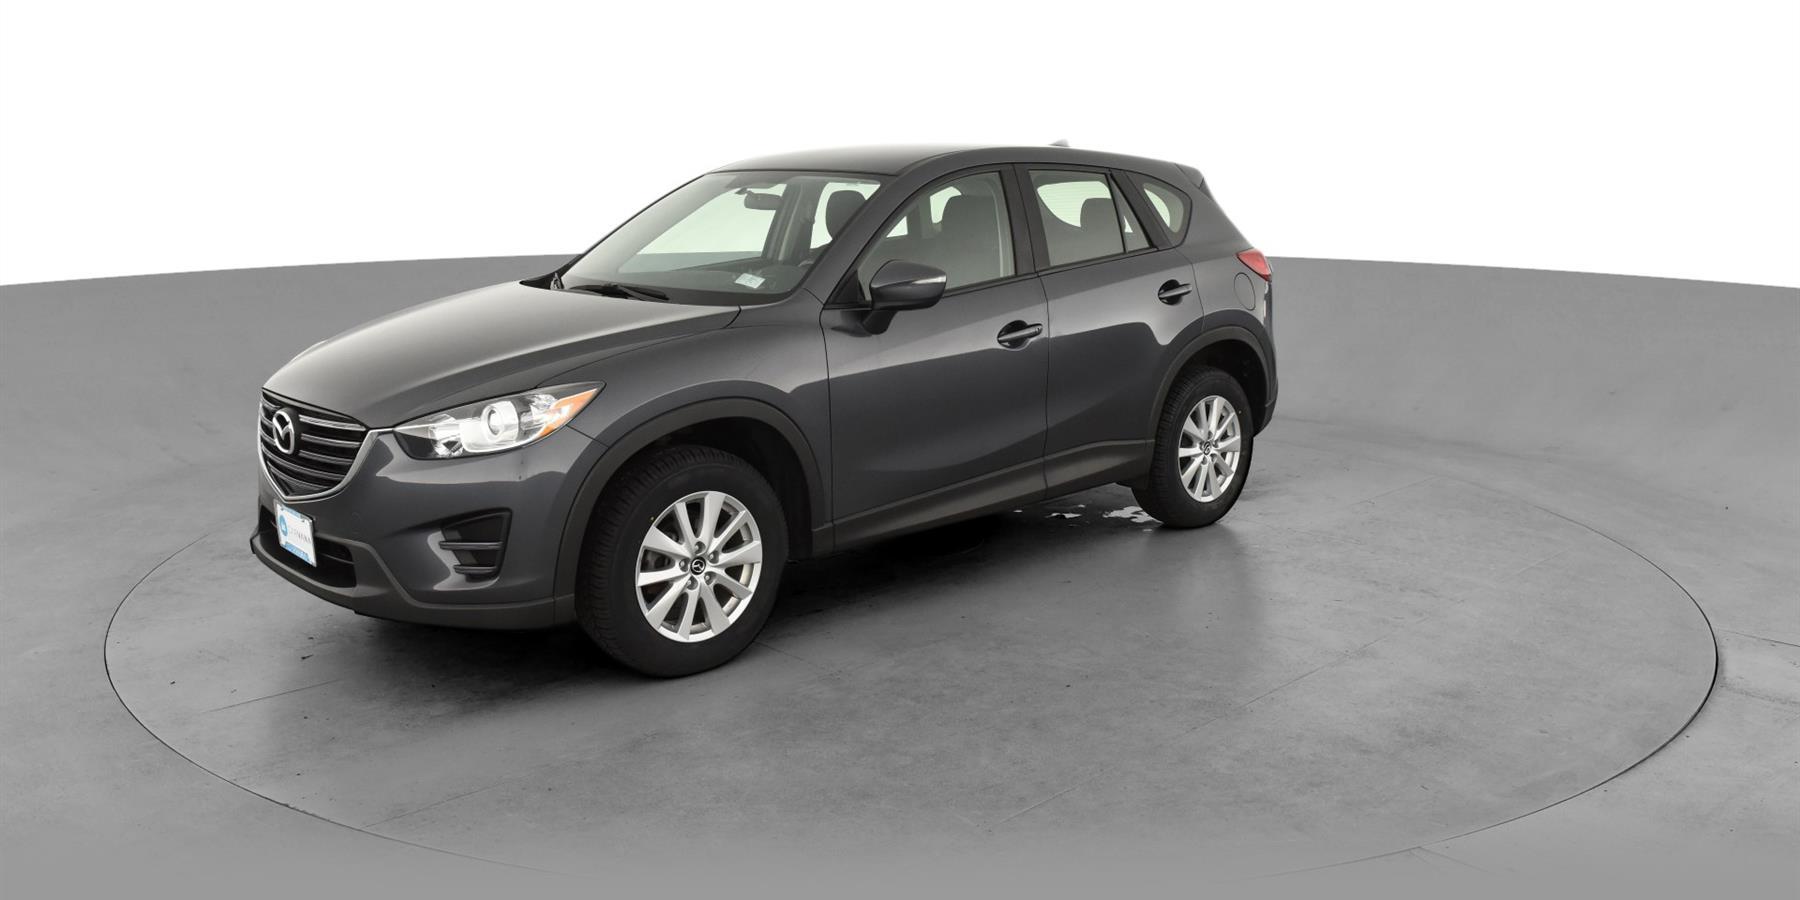 2016 Mazda Cx 5 Sport Suv 4d For Sale Carvana